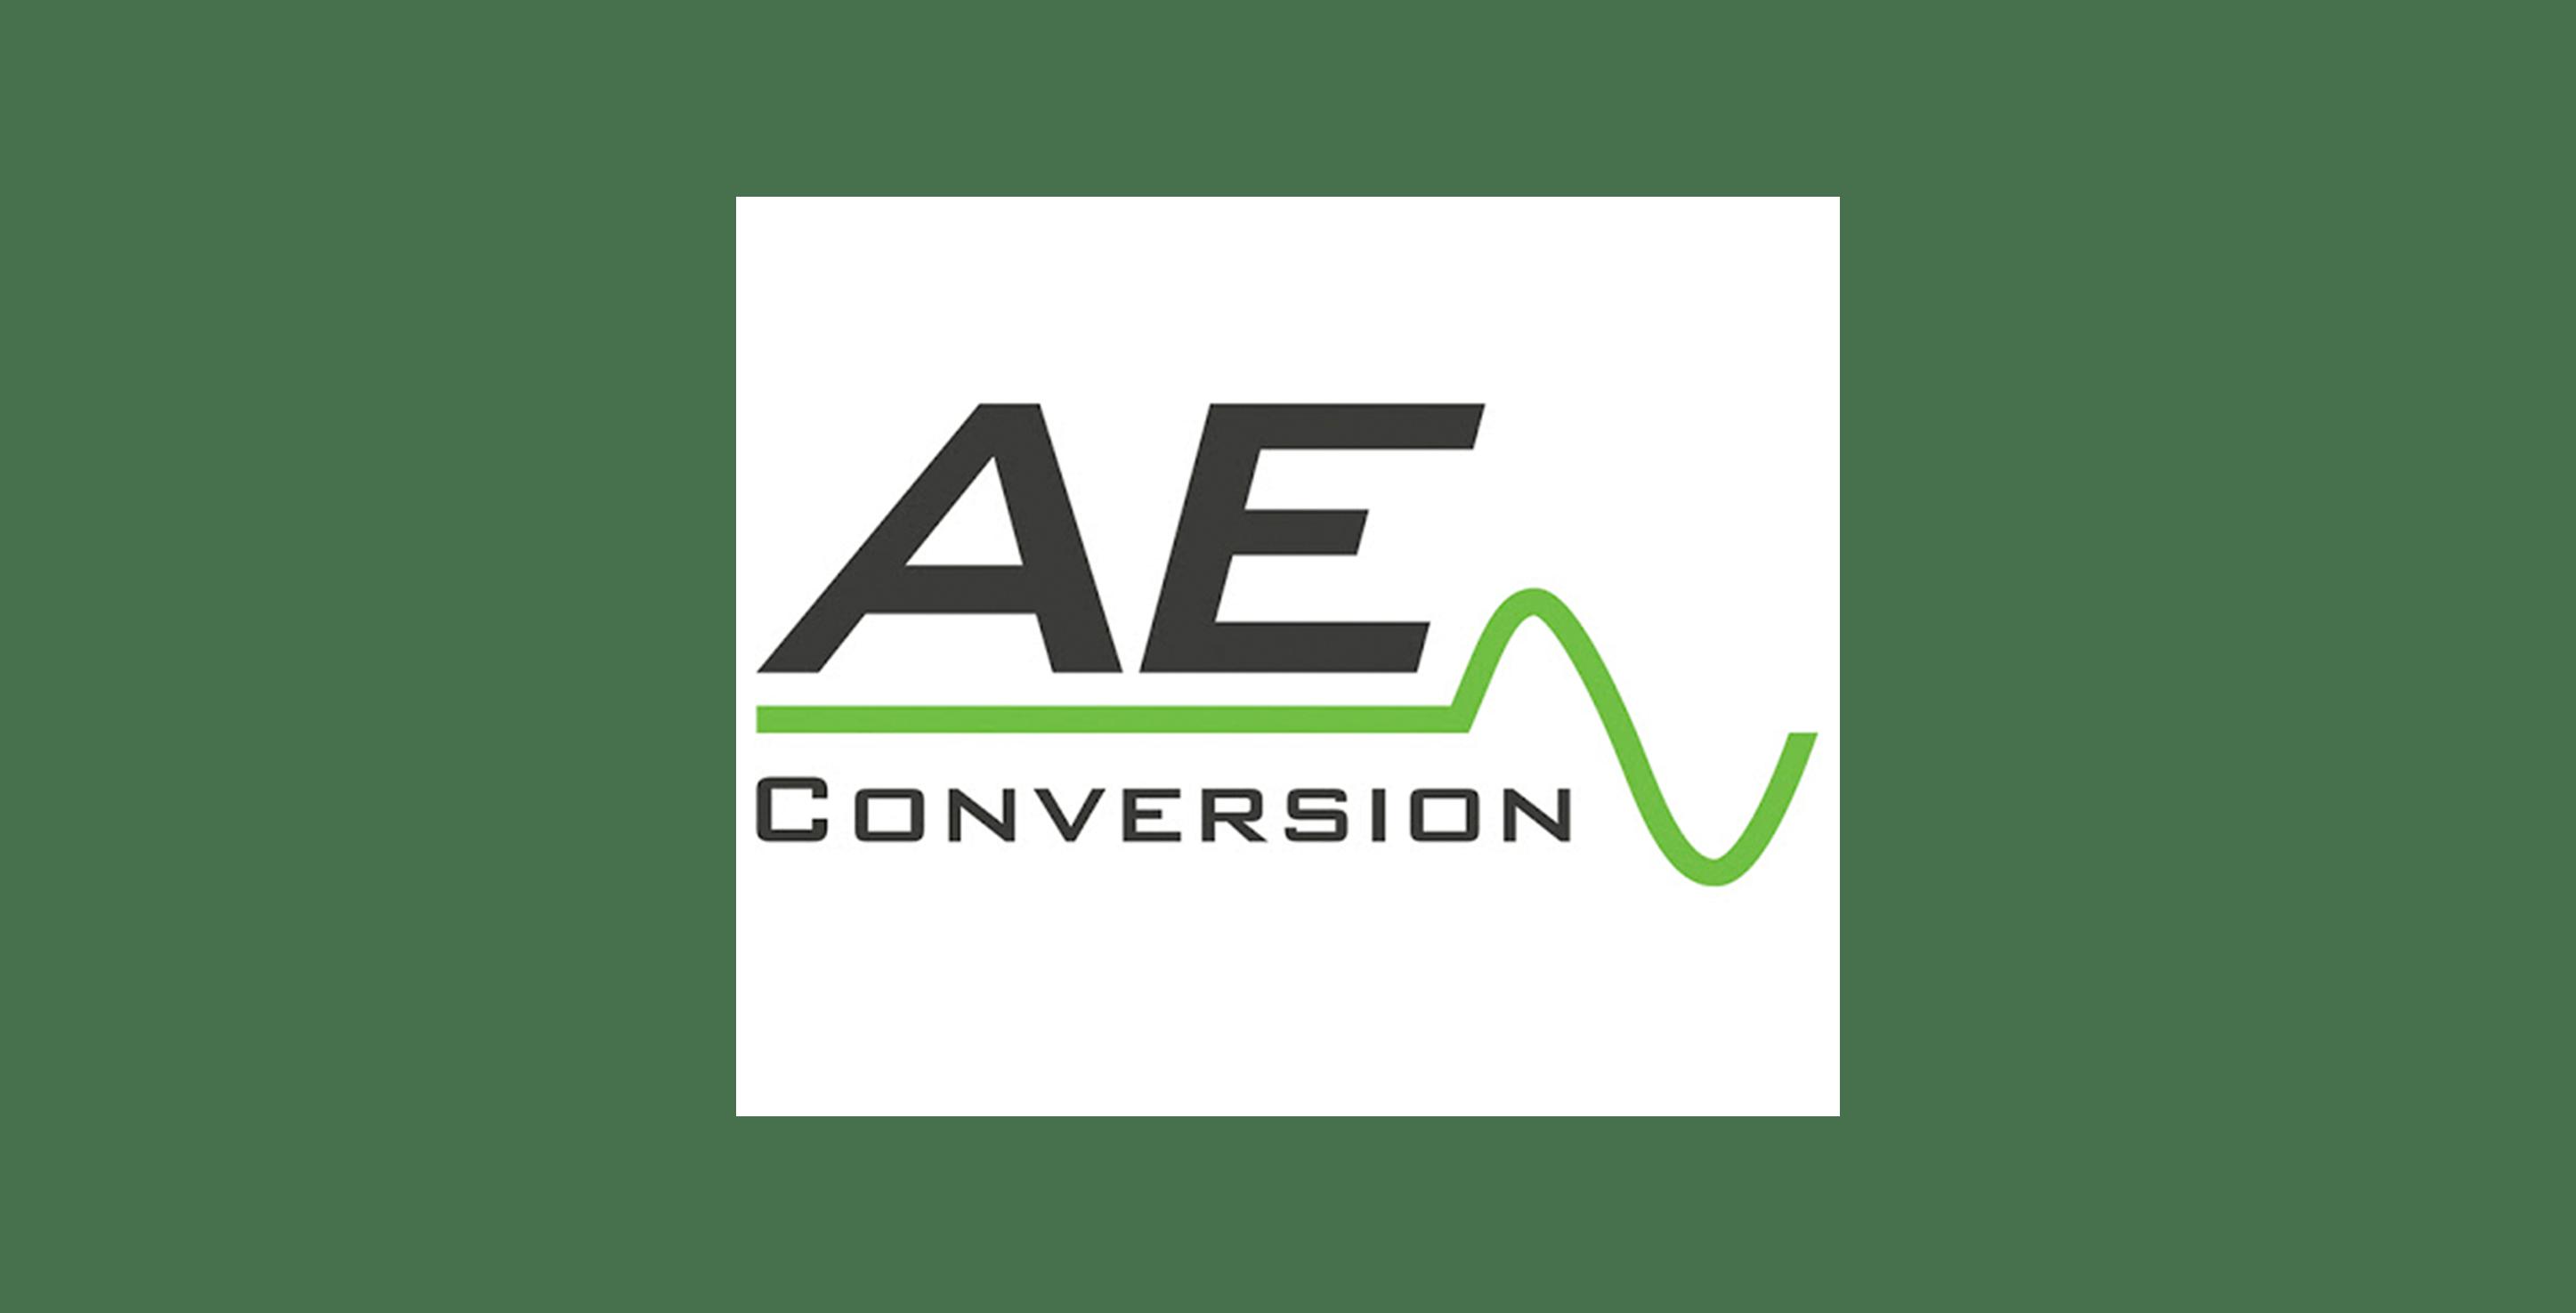 AEconversion GmbH & Co. KG